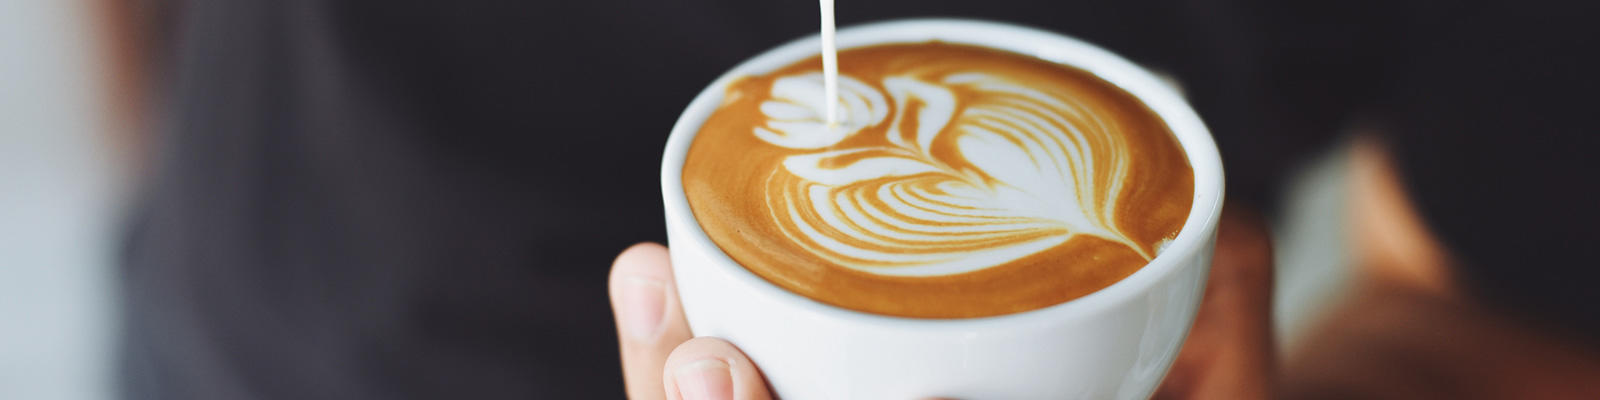 best coffee in perth